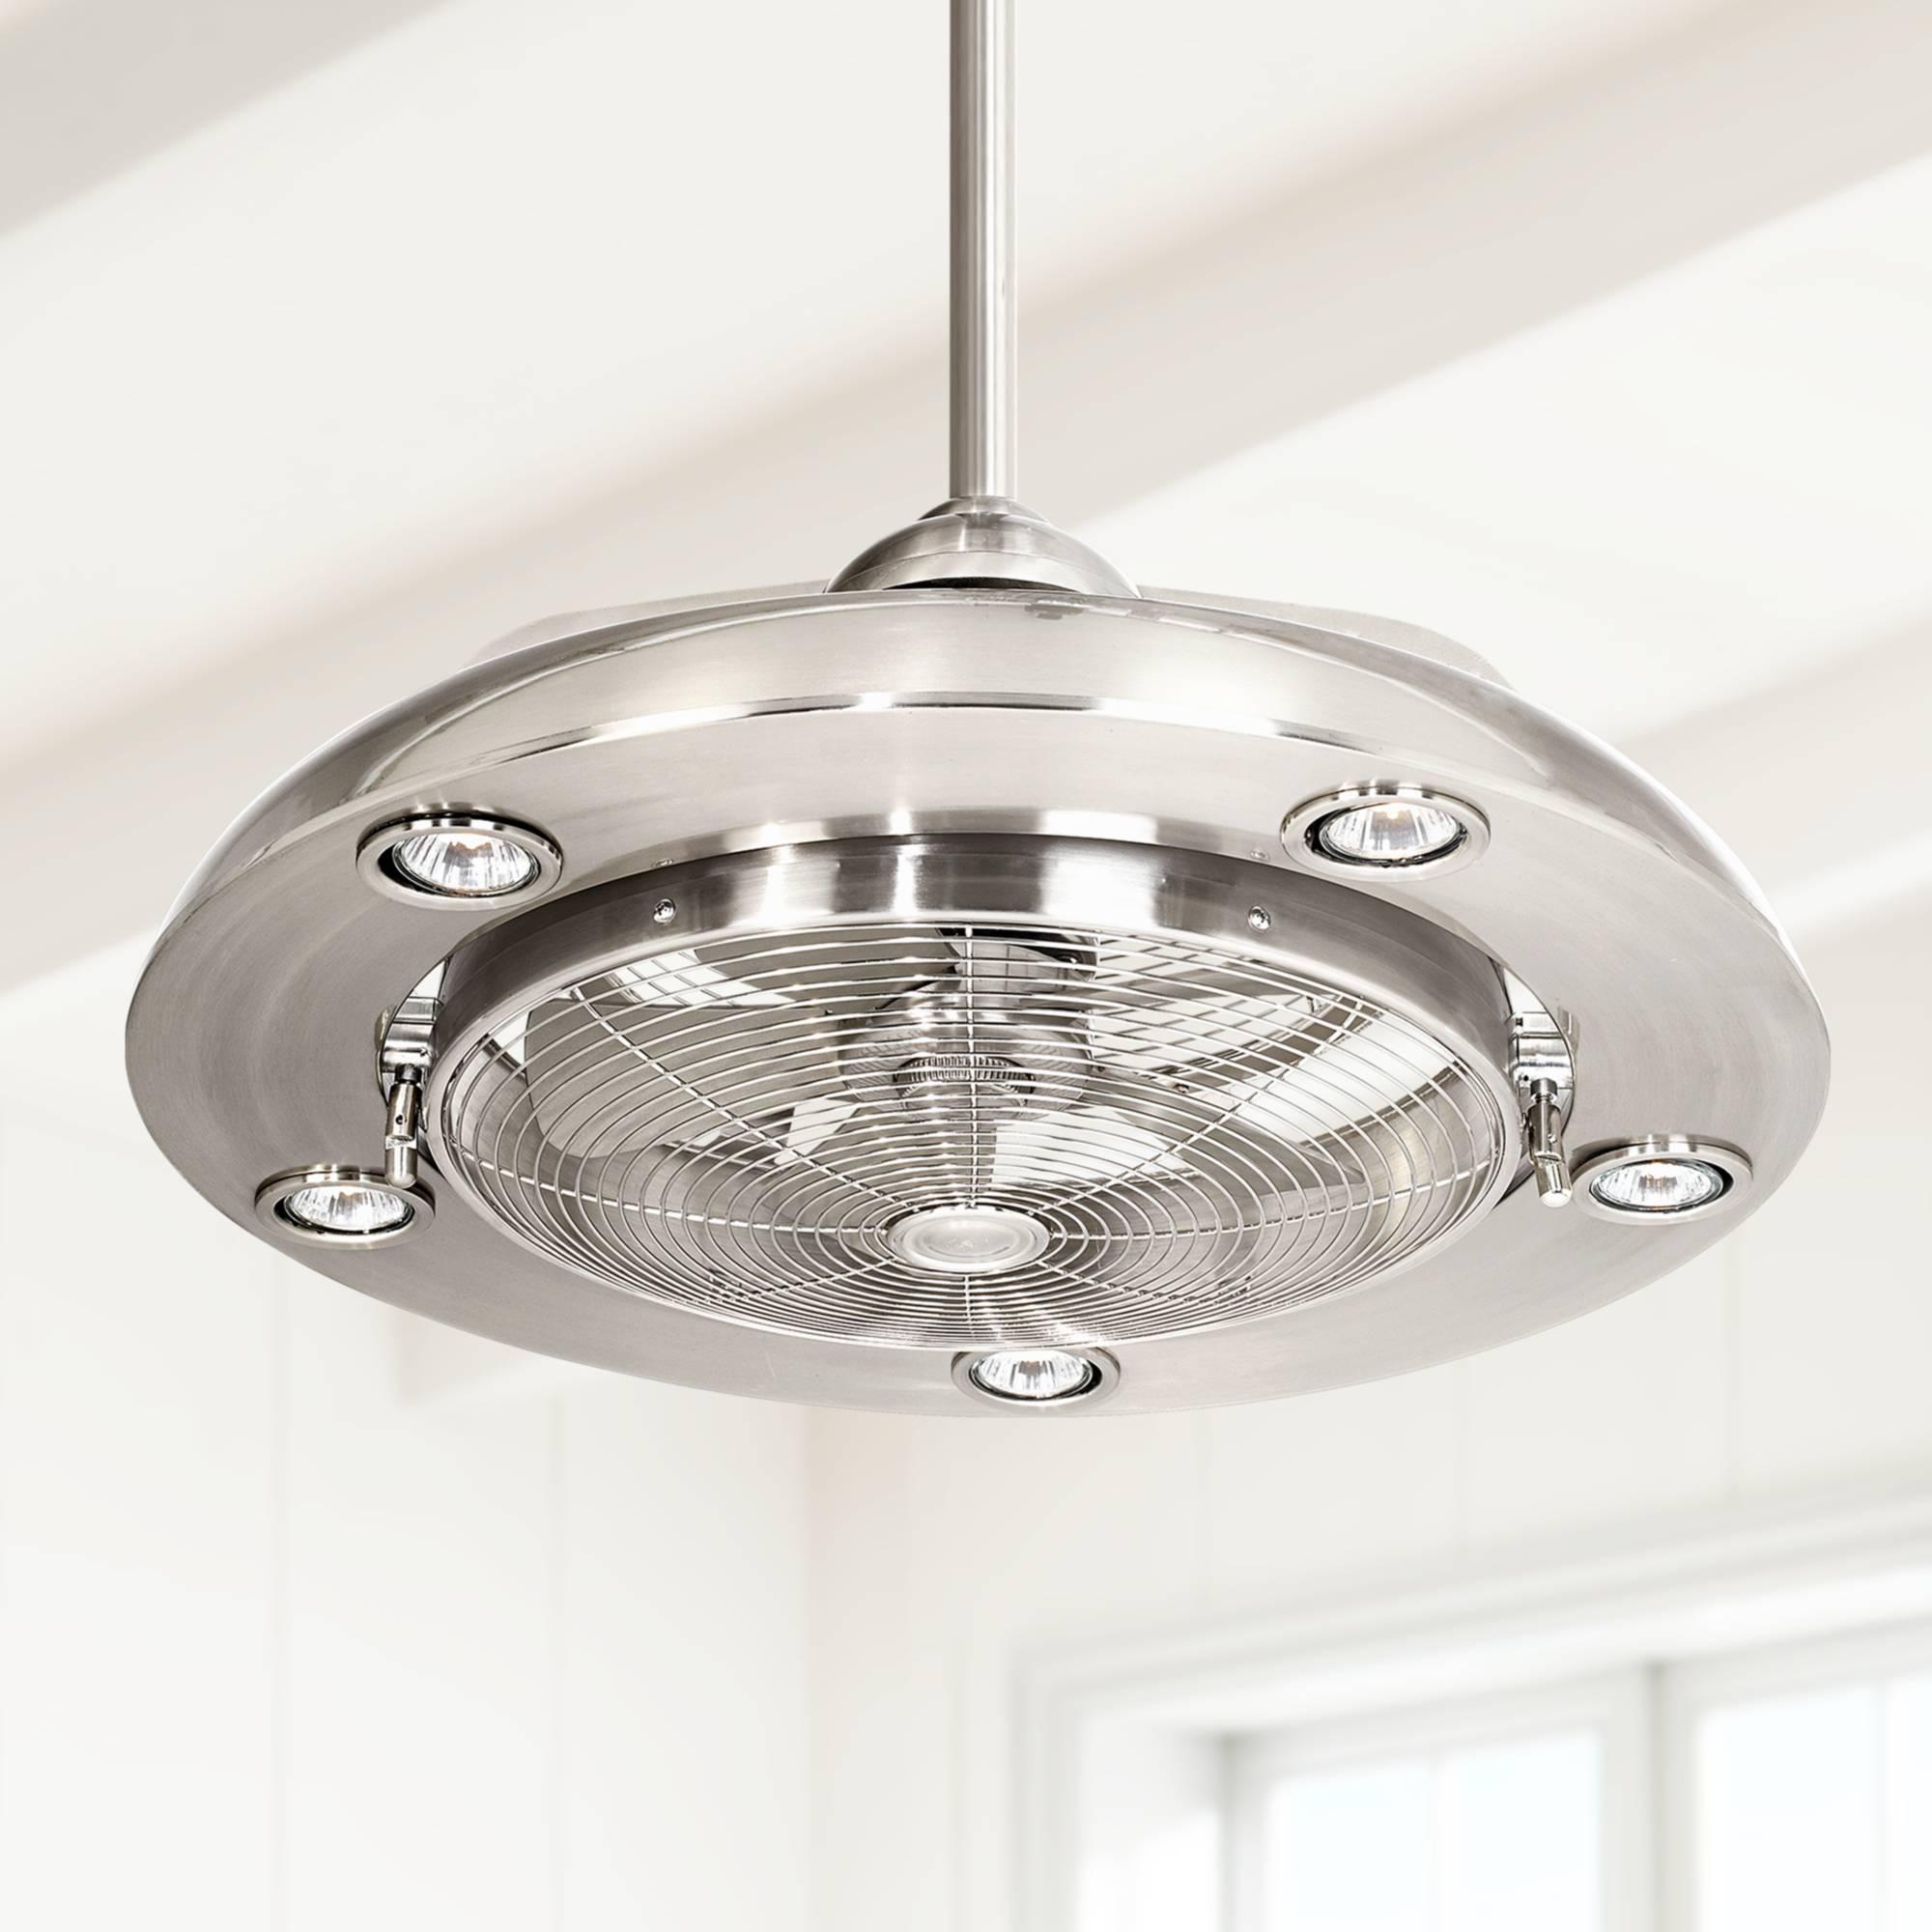 24 Modern Ceiling Fan With Light Led